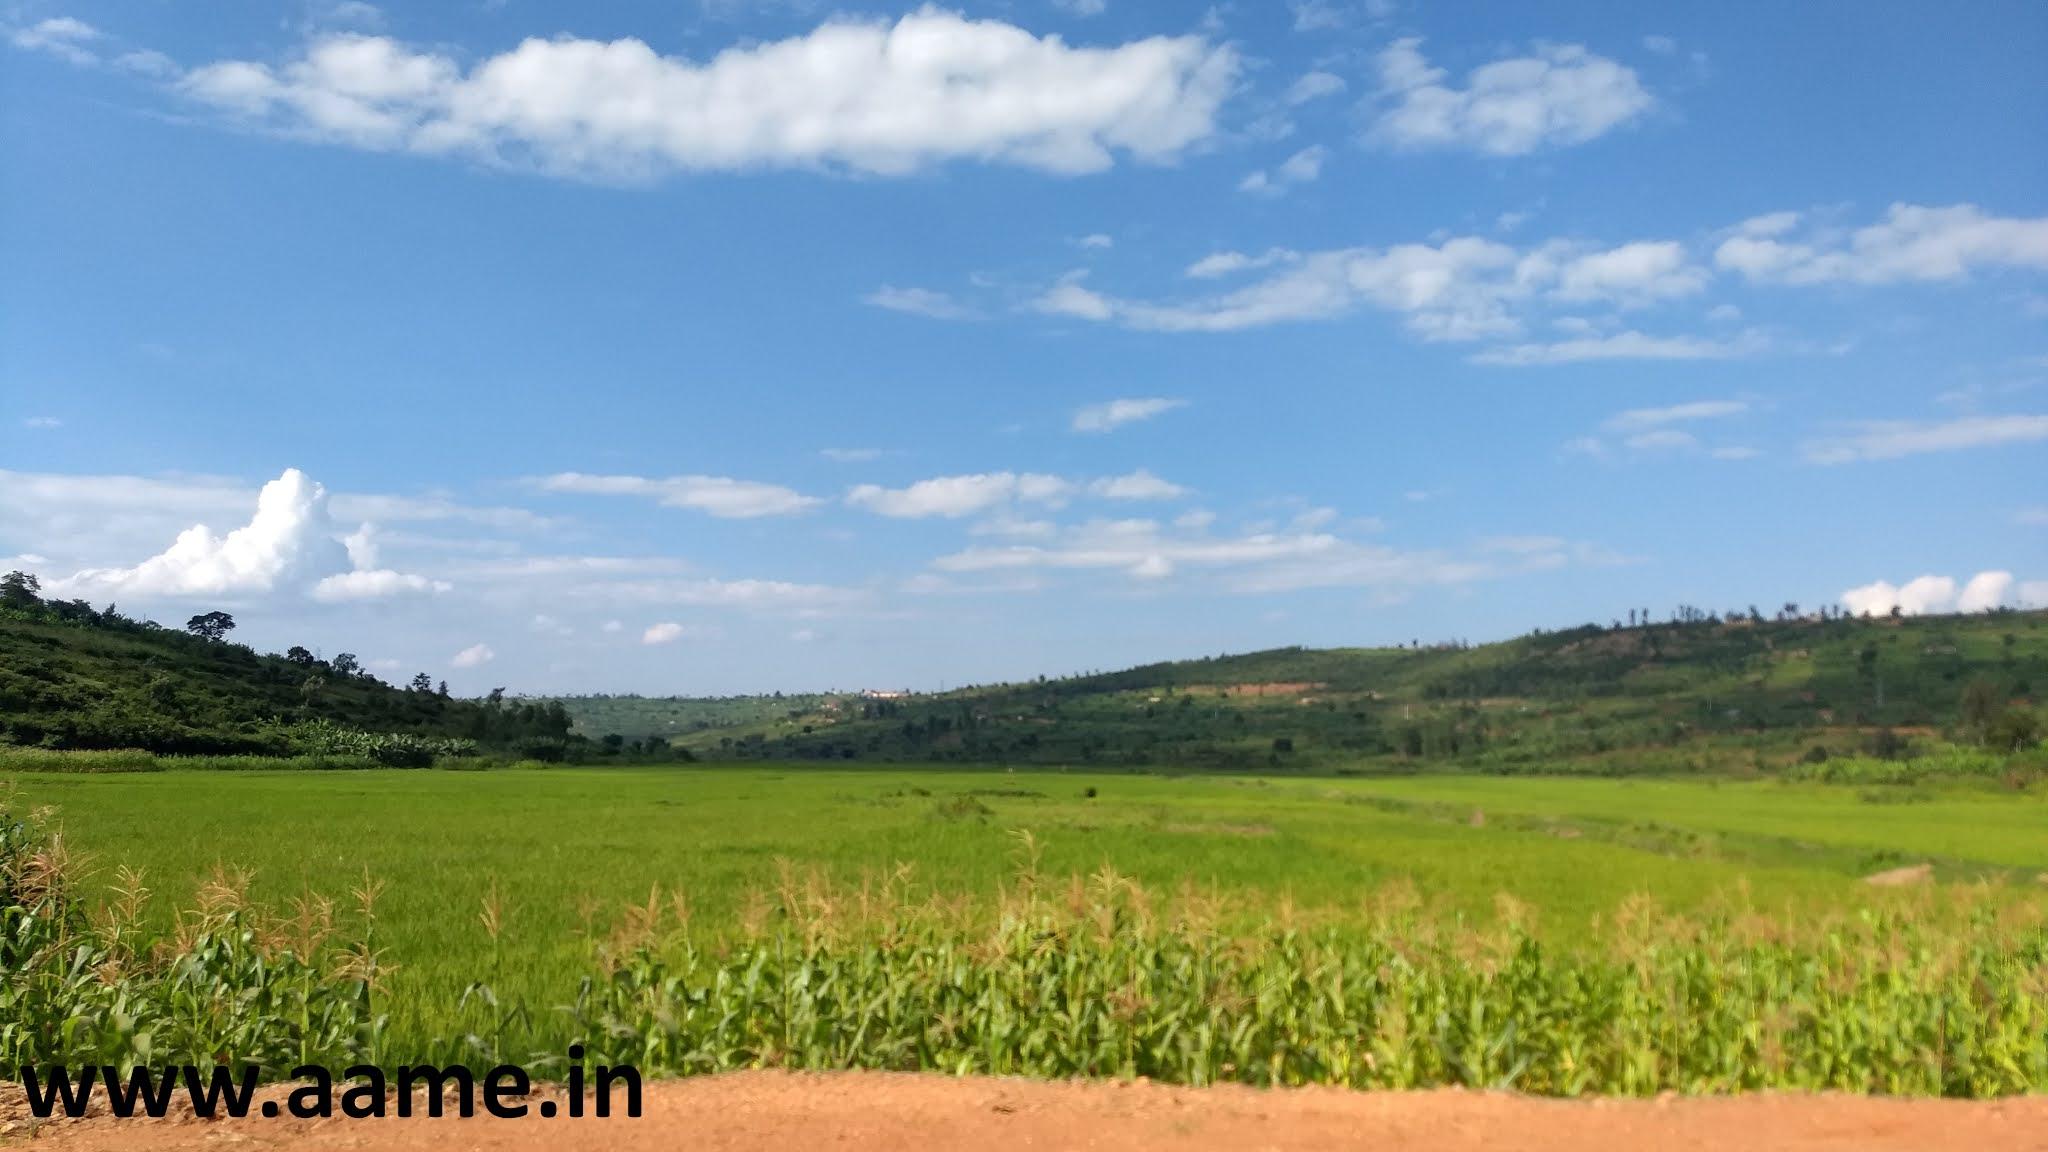 Rwanda - Landscape - 01